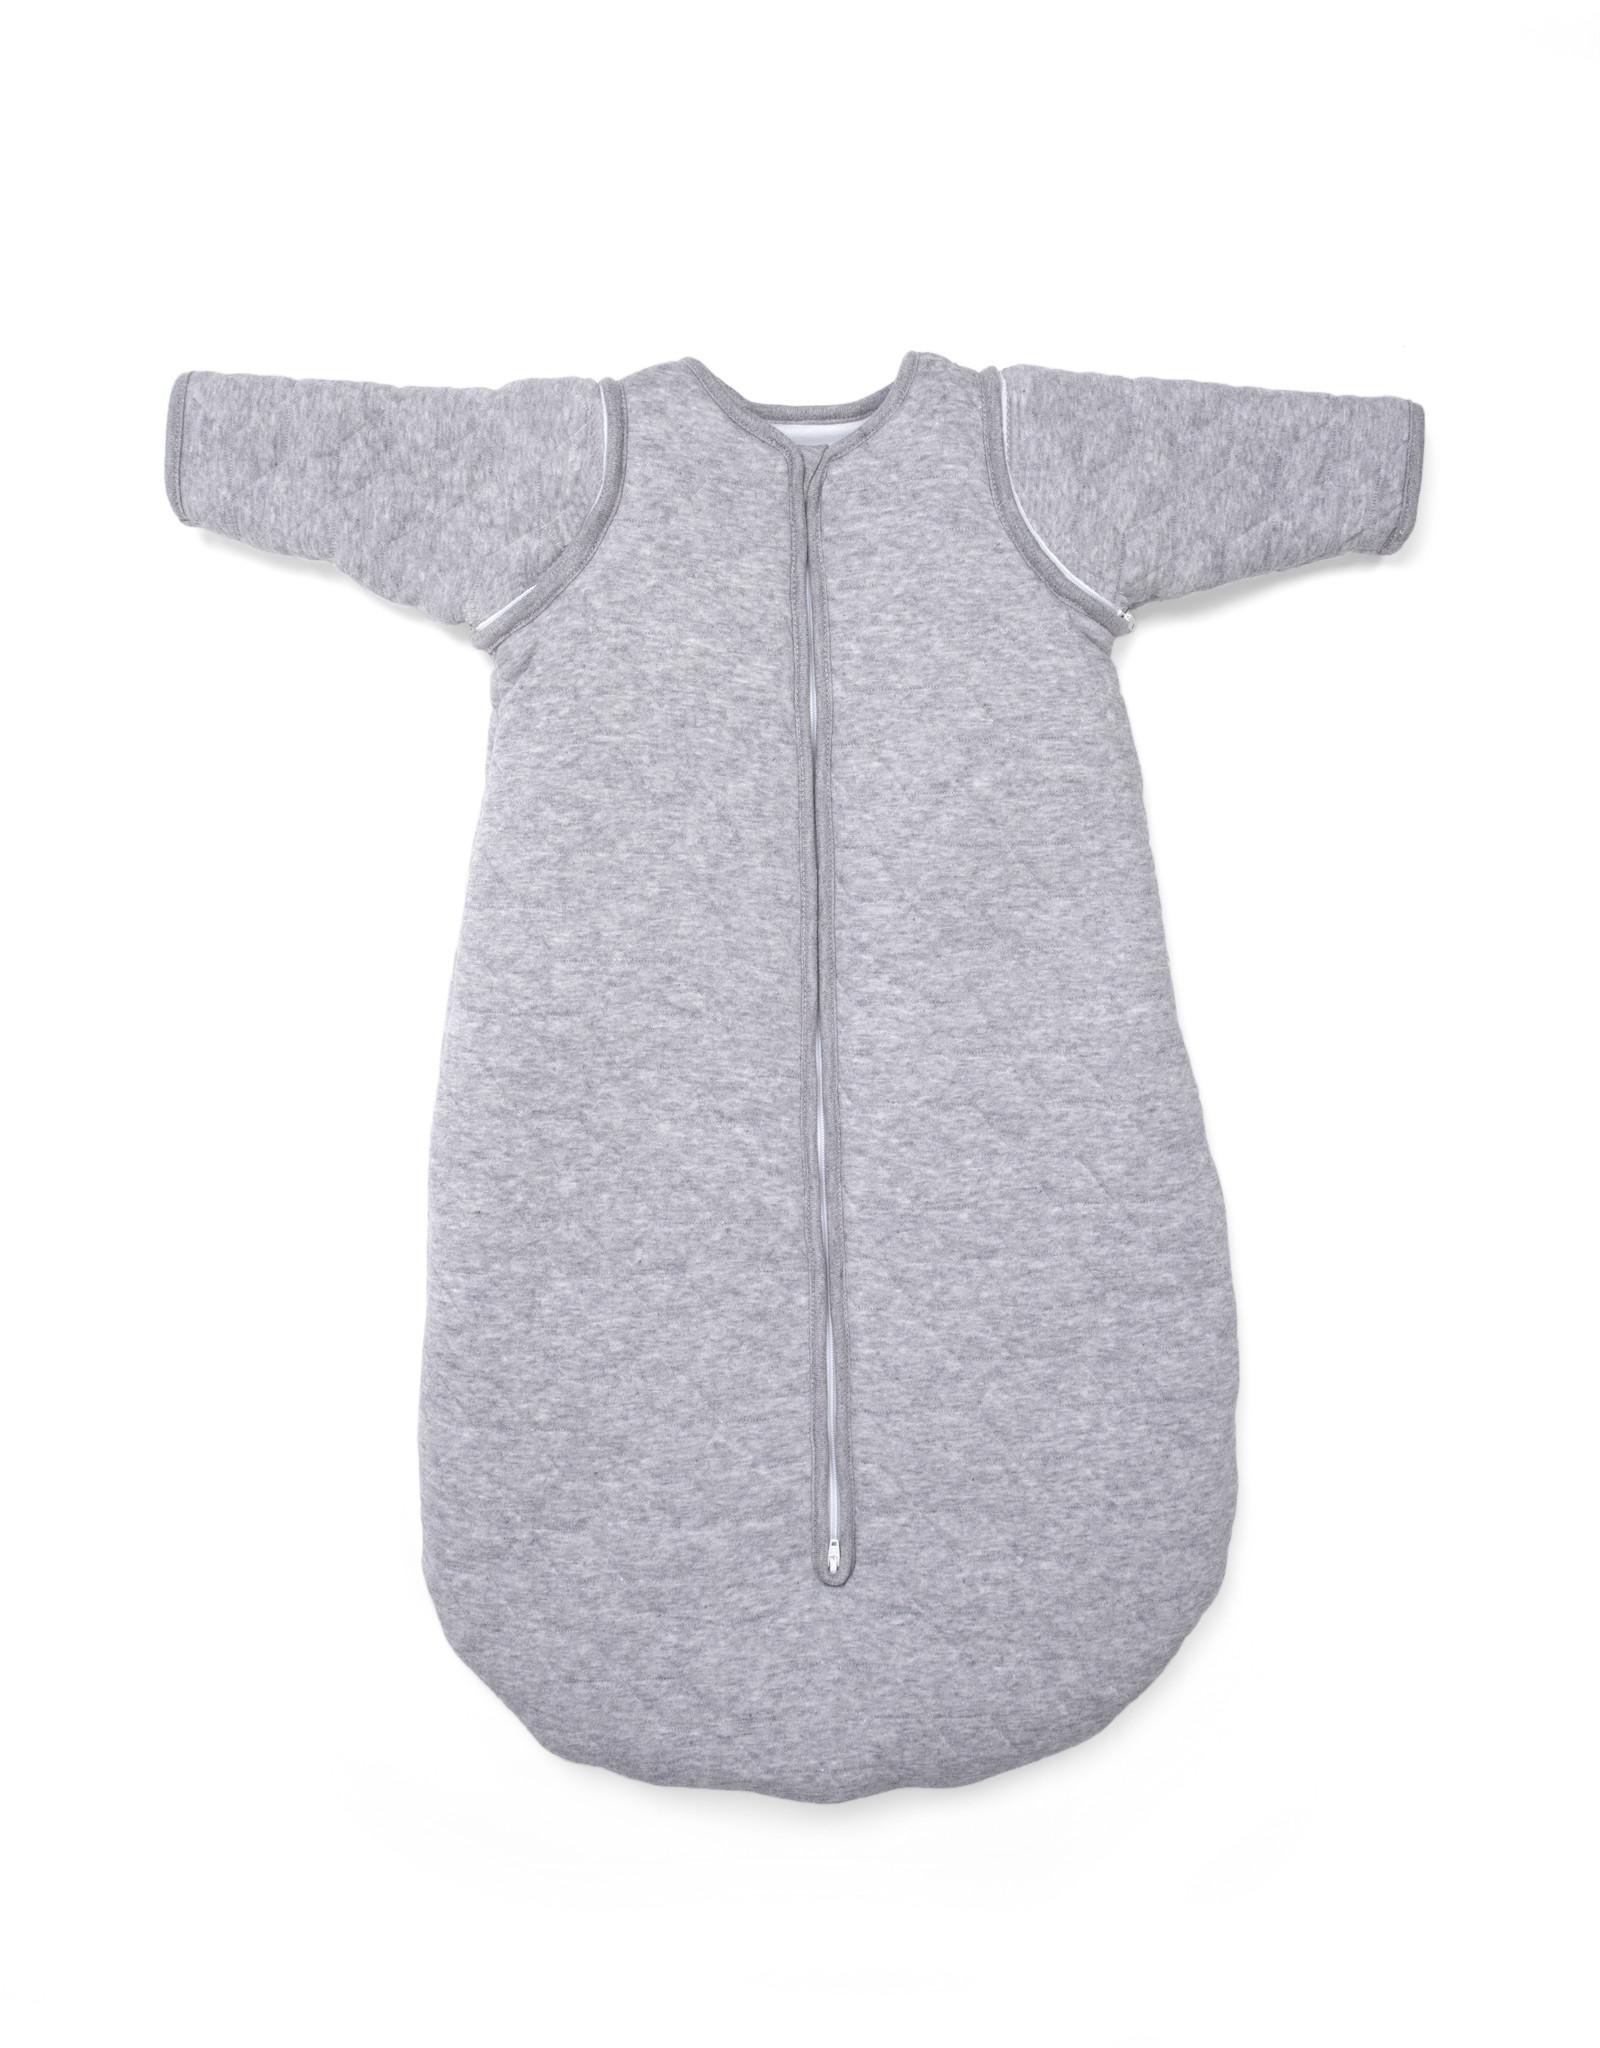 Jersey slaapzak 90cm met afritsbare mouwen Star Grey Melange-7